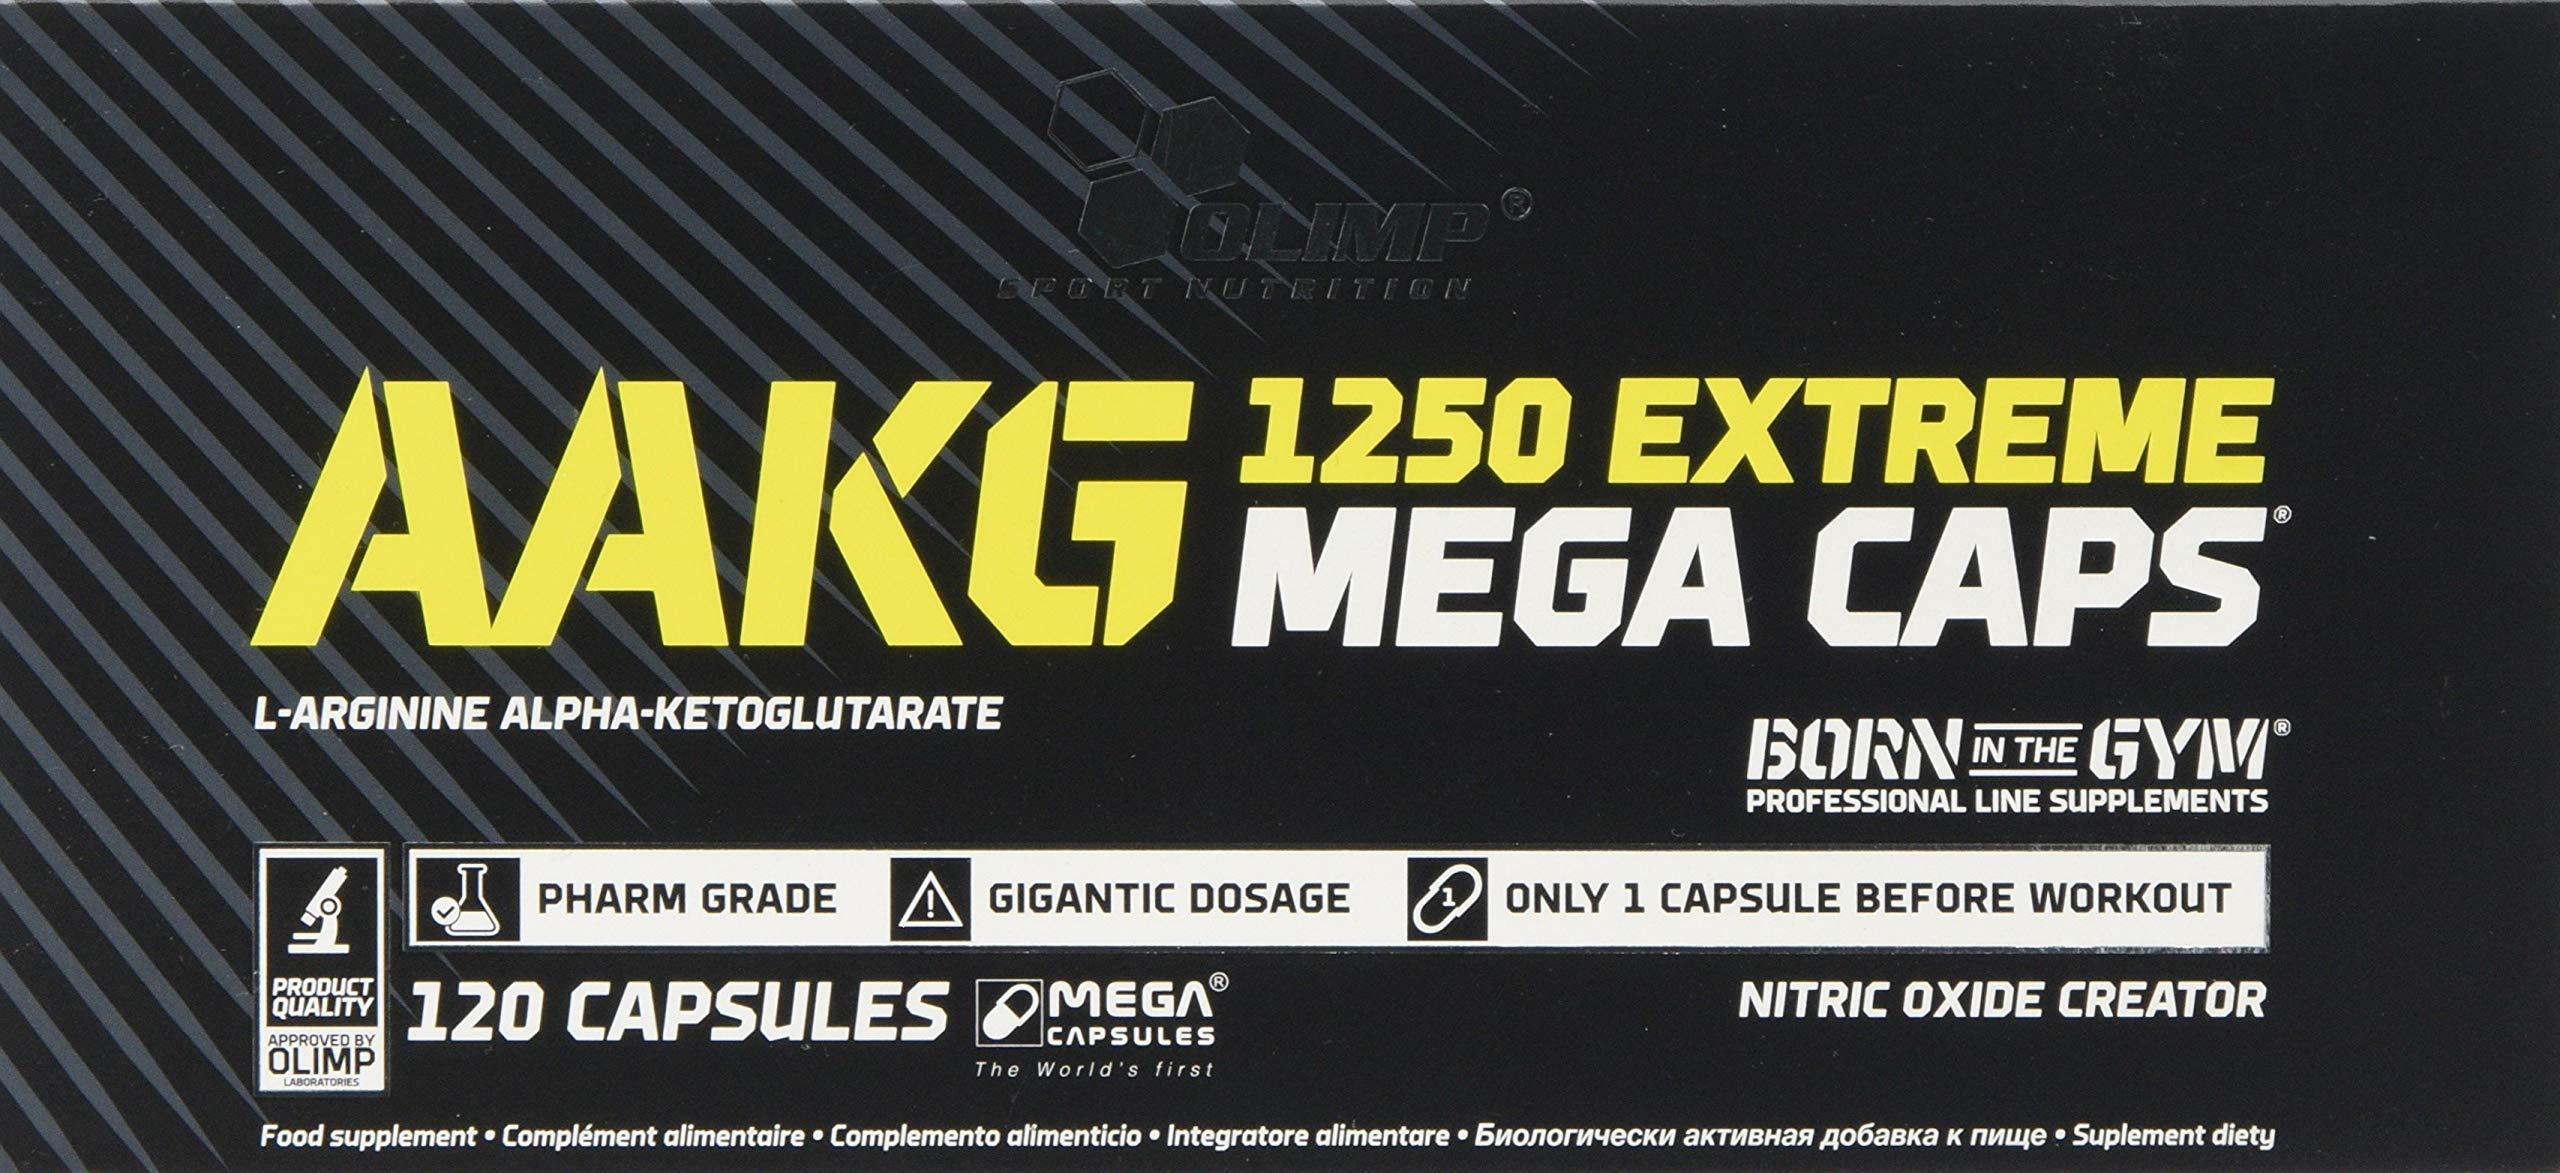 Olimp AAKG Extreme Mega Capsules – Pack of 120 Capsules